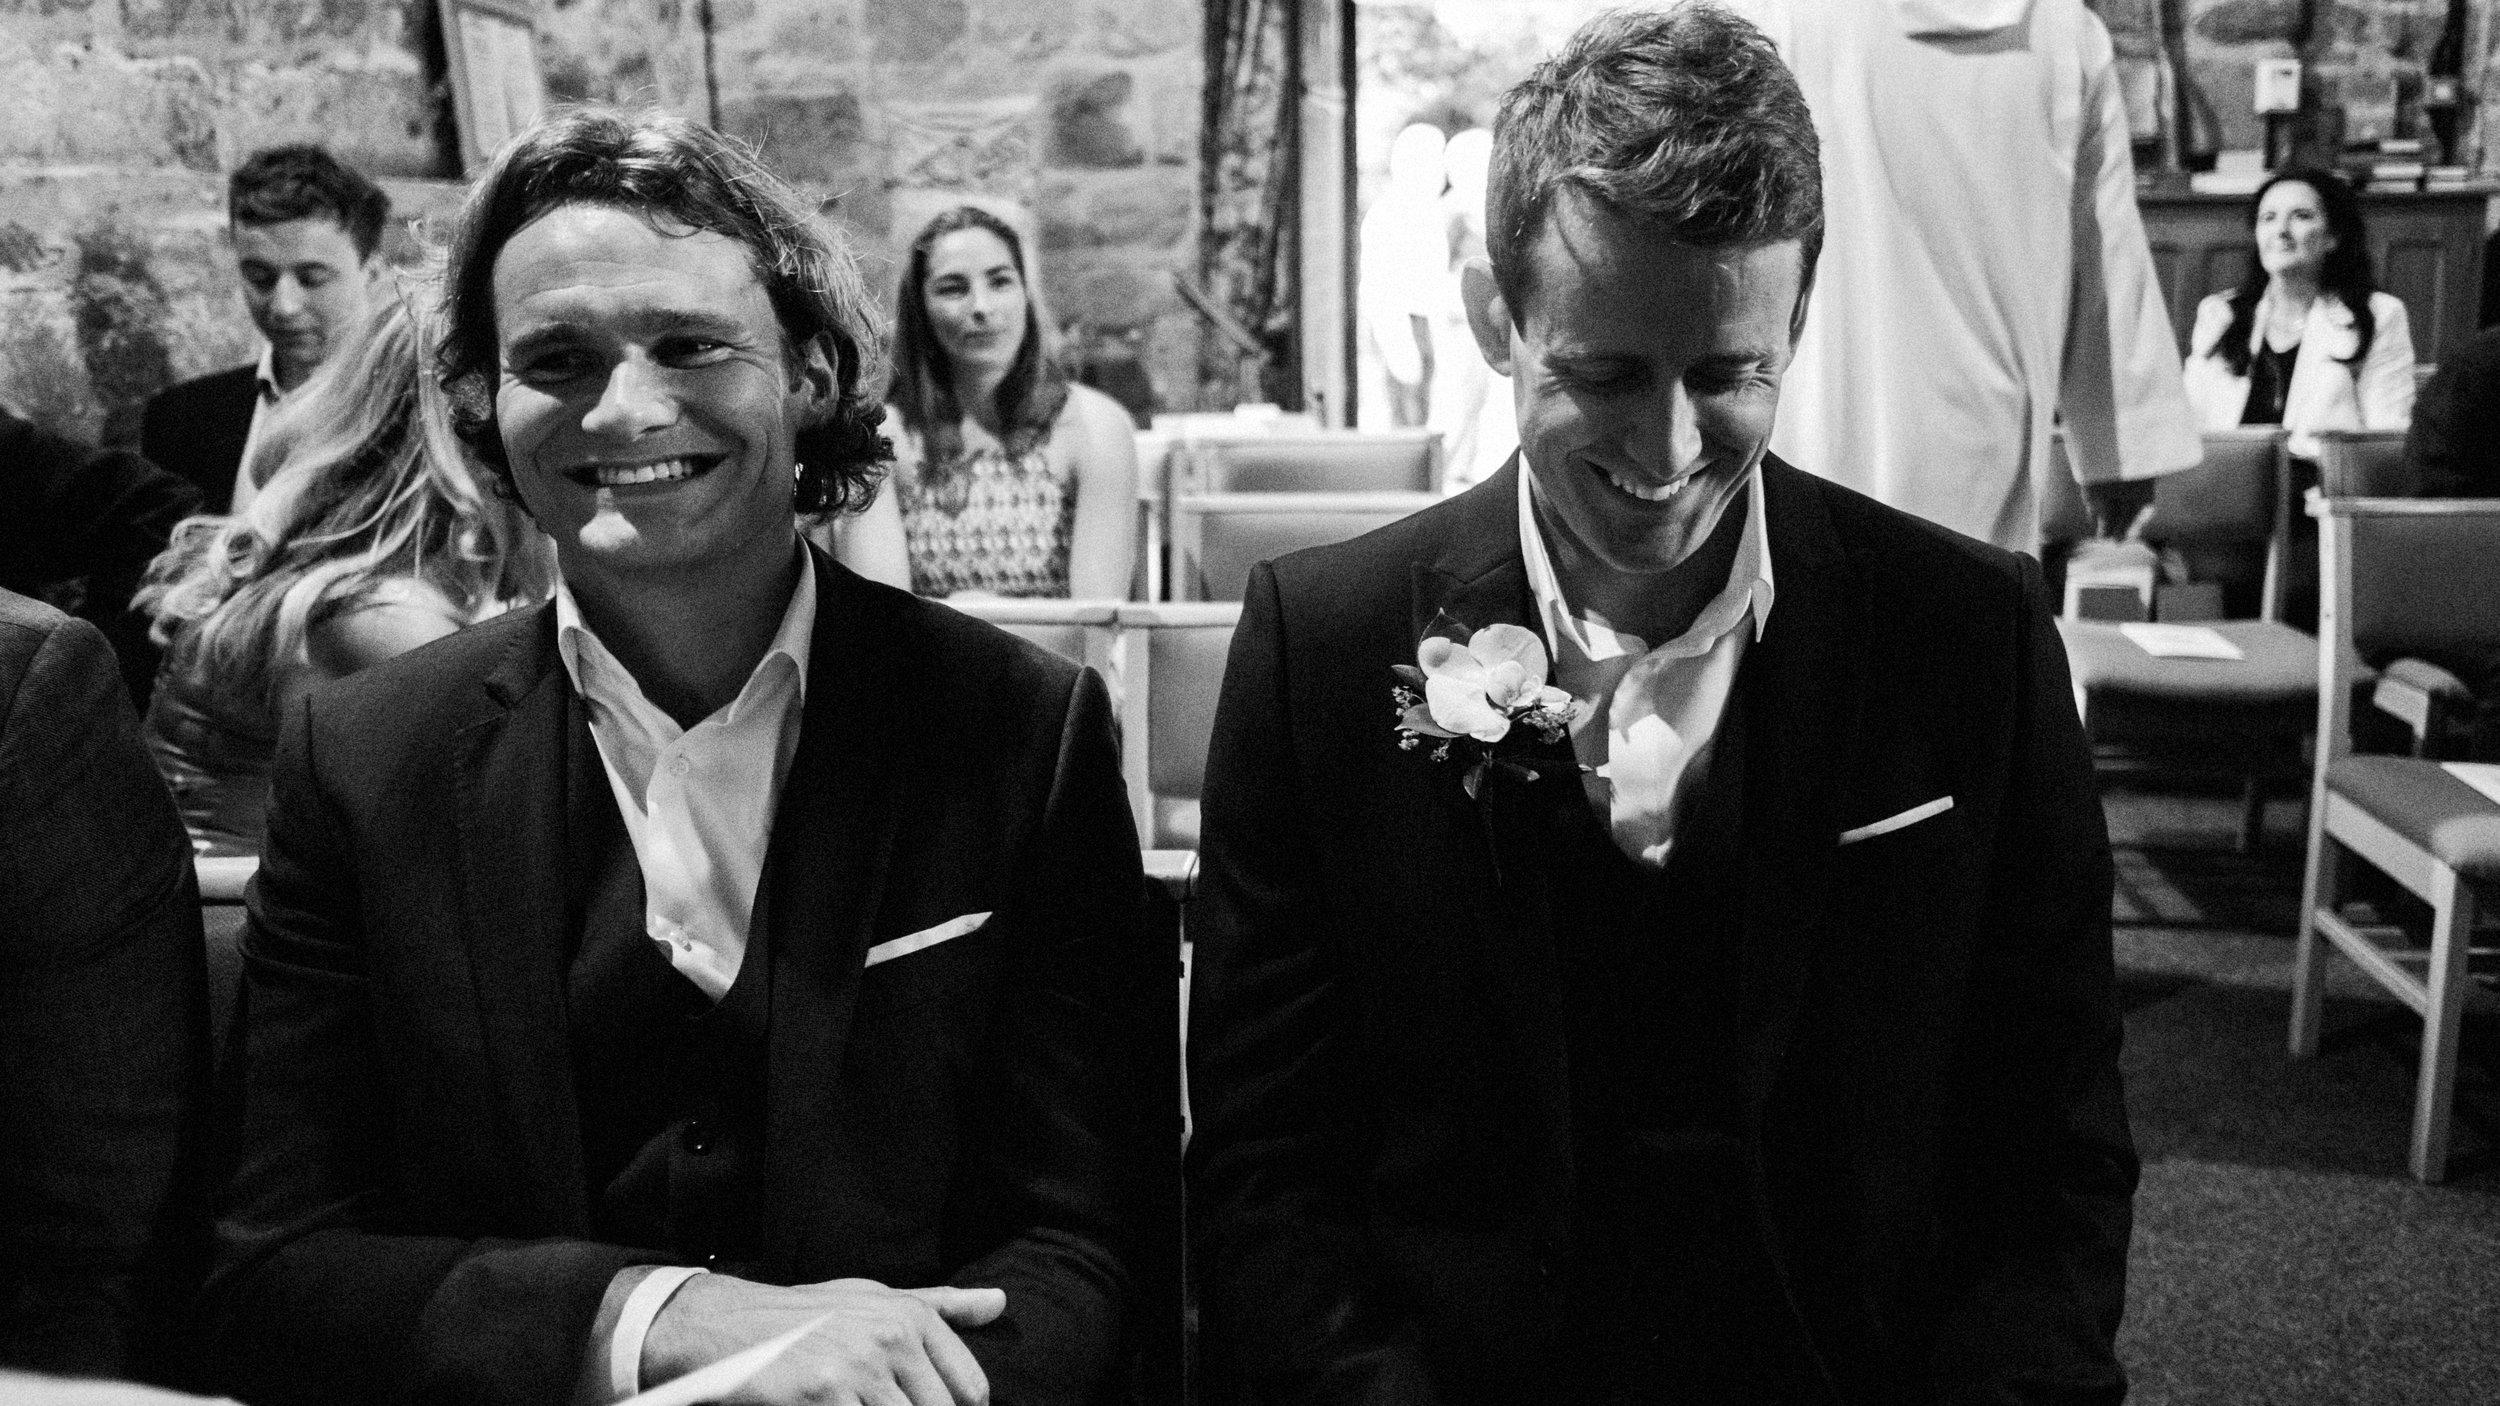 prestbury-cheshire-wedding-photographer-0005.JPG